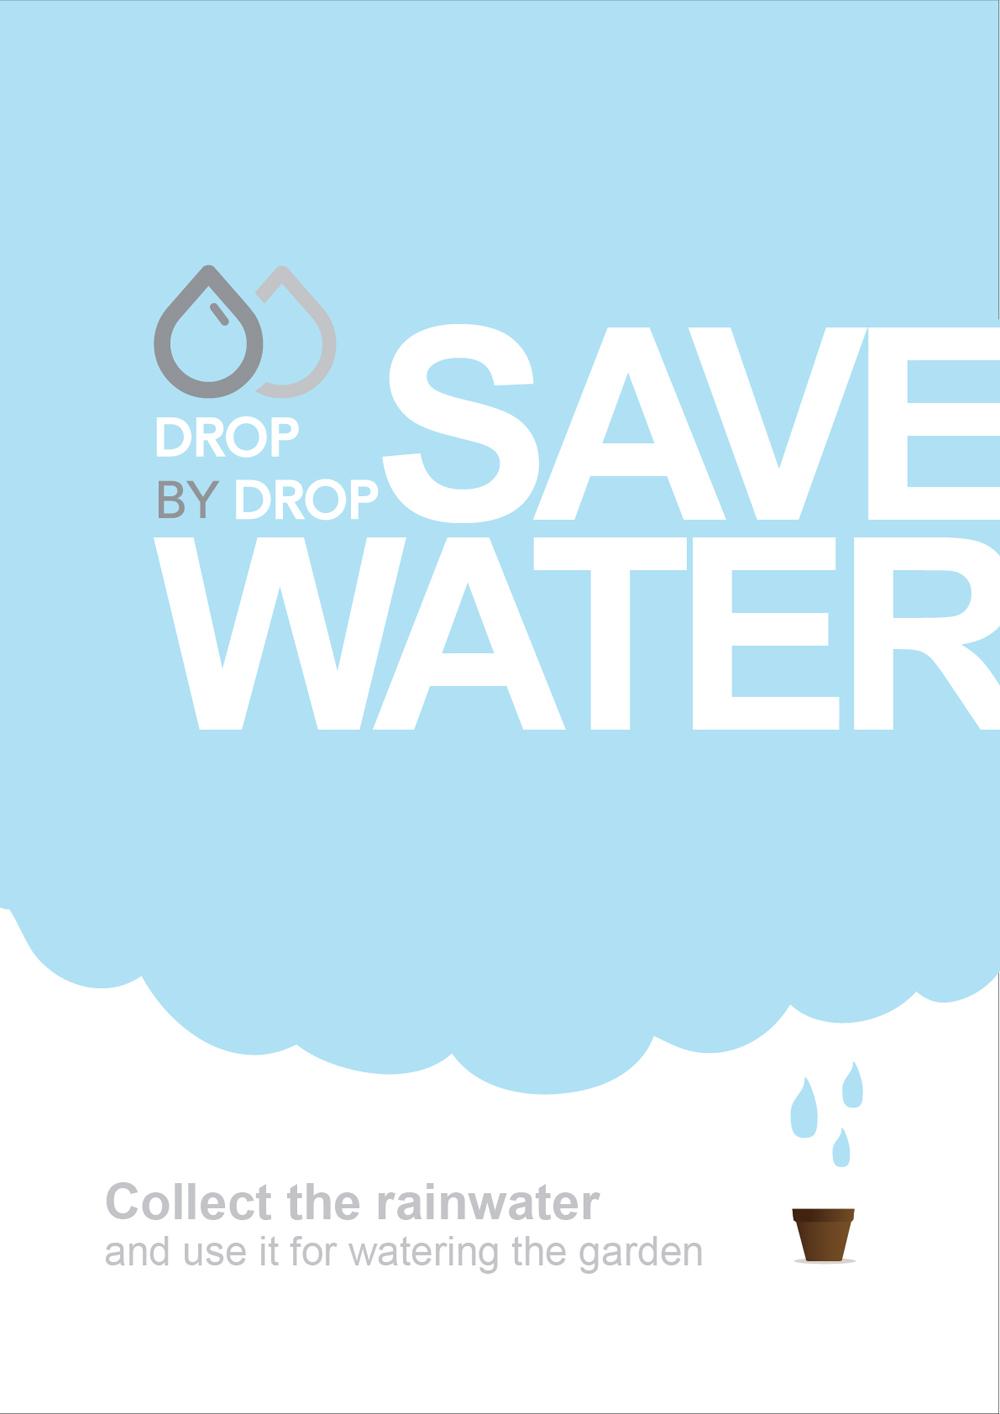 A166d1251403155604ba23248f5g save water poster competition altavistaventures Images